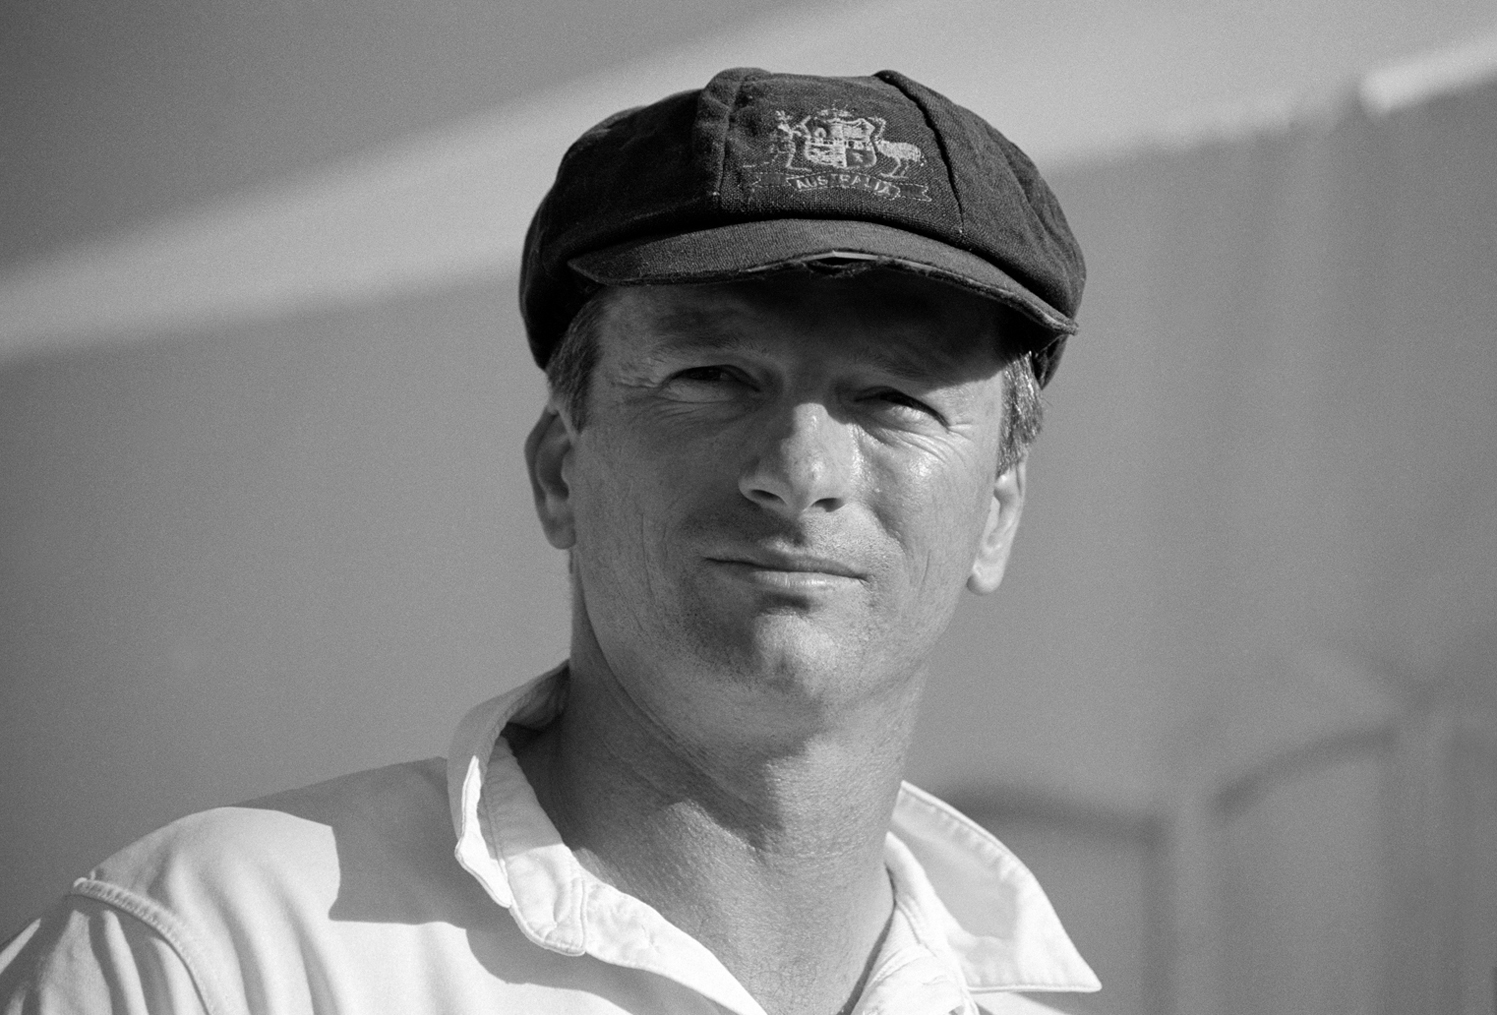 Steve Waugh, Australian Cricket Captain